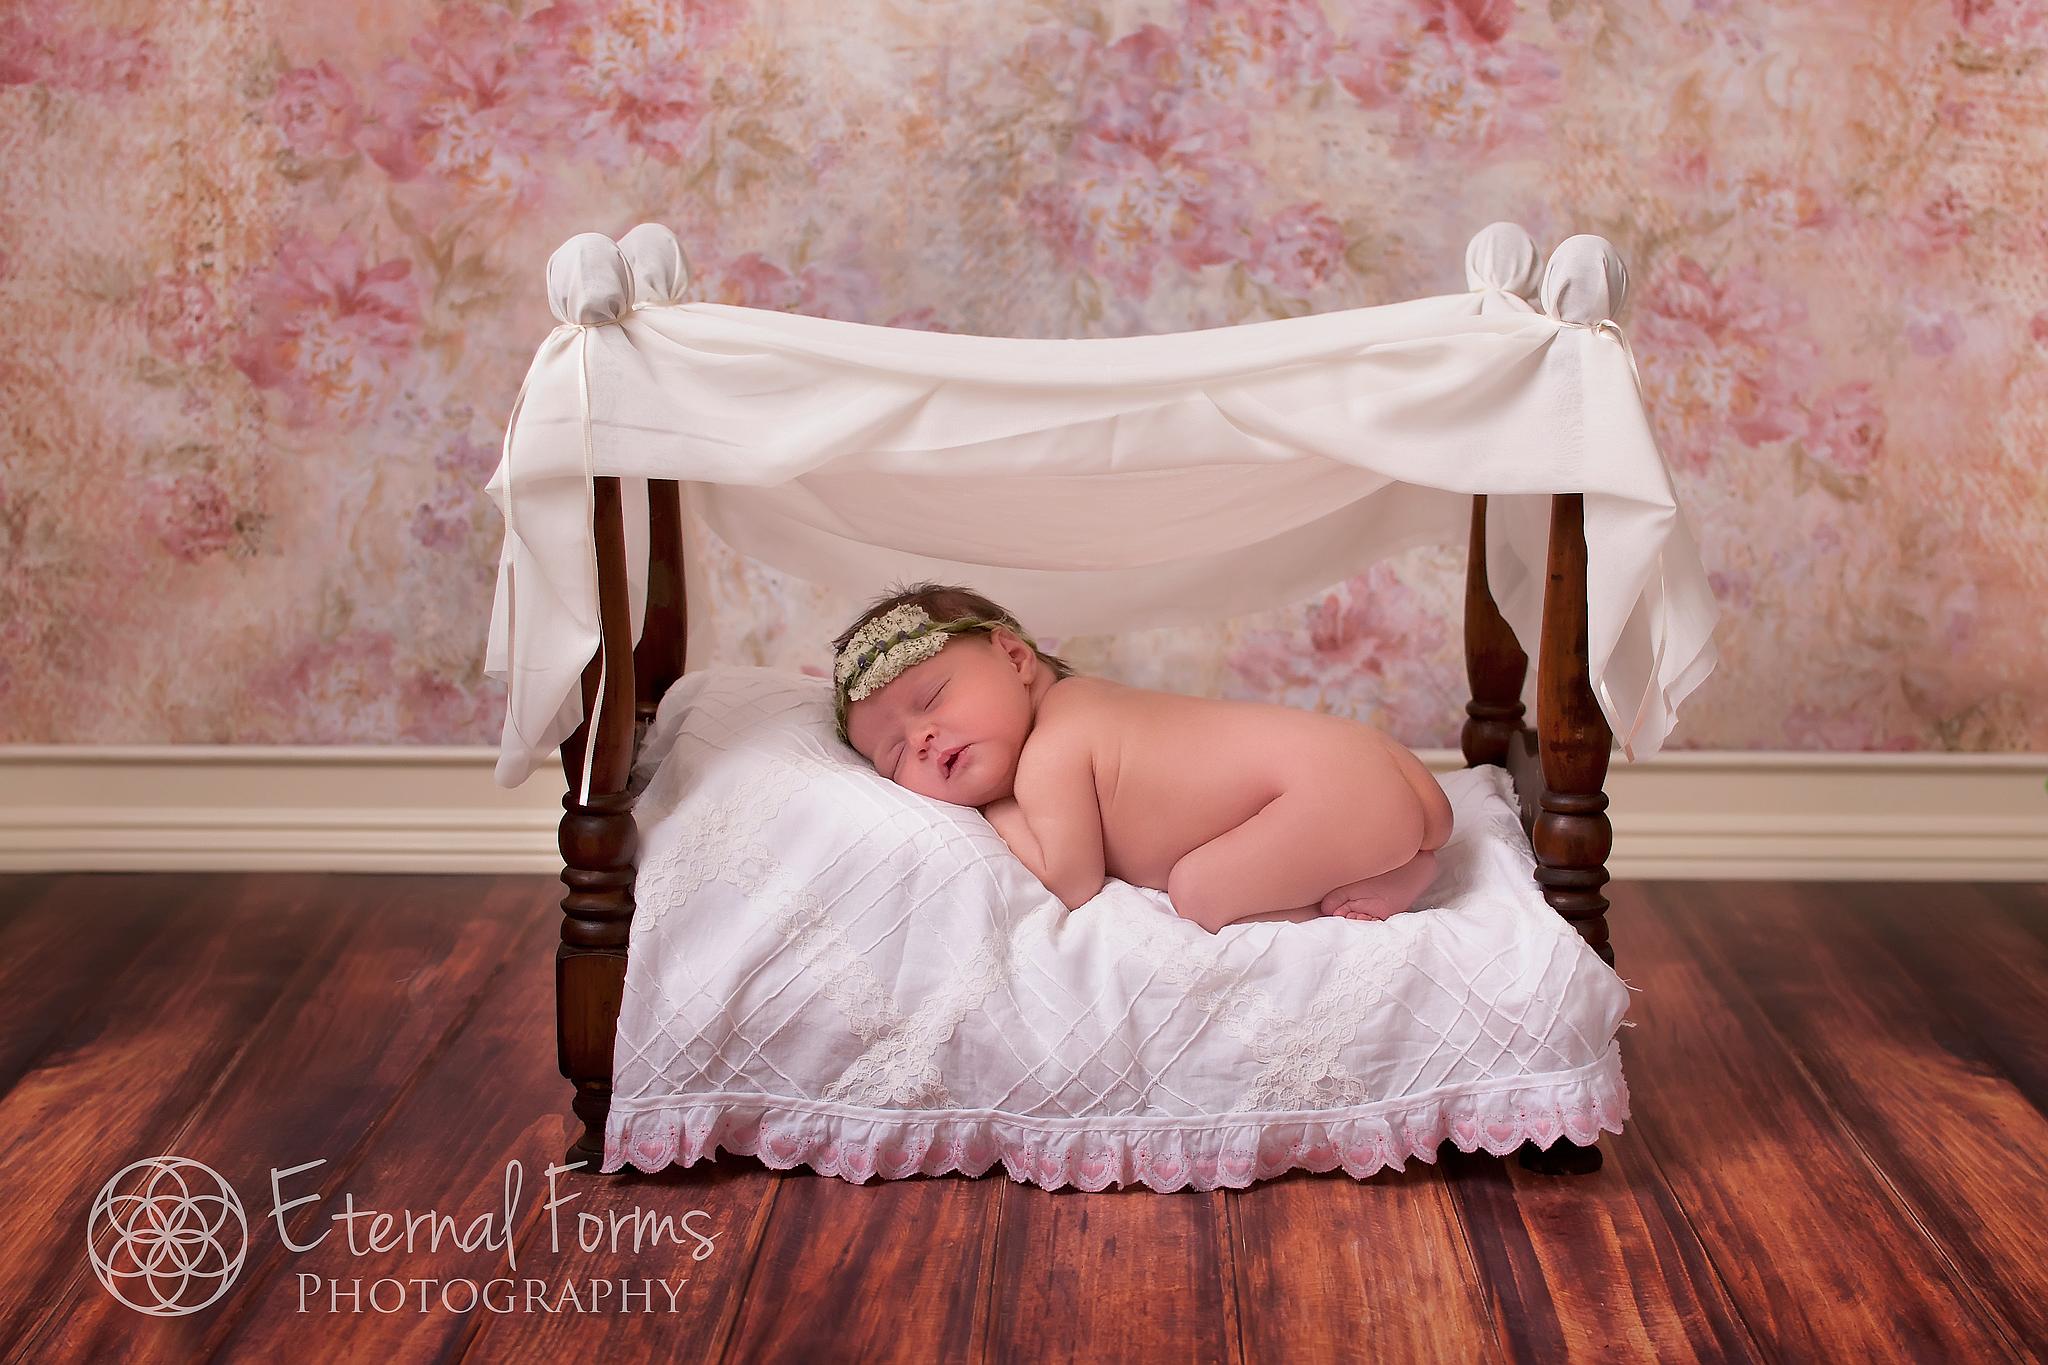 newborn on baby bed